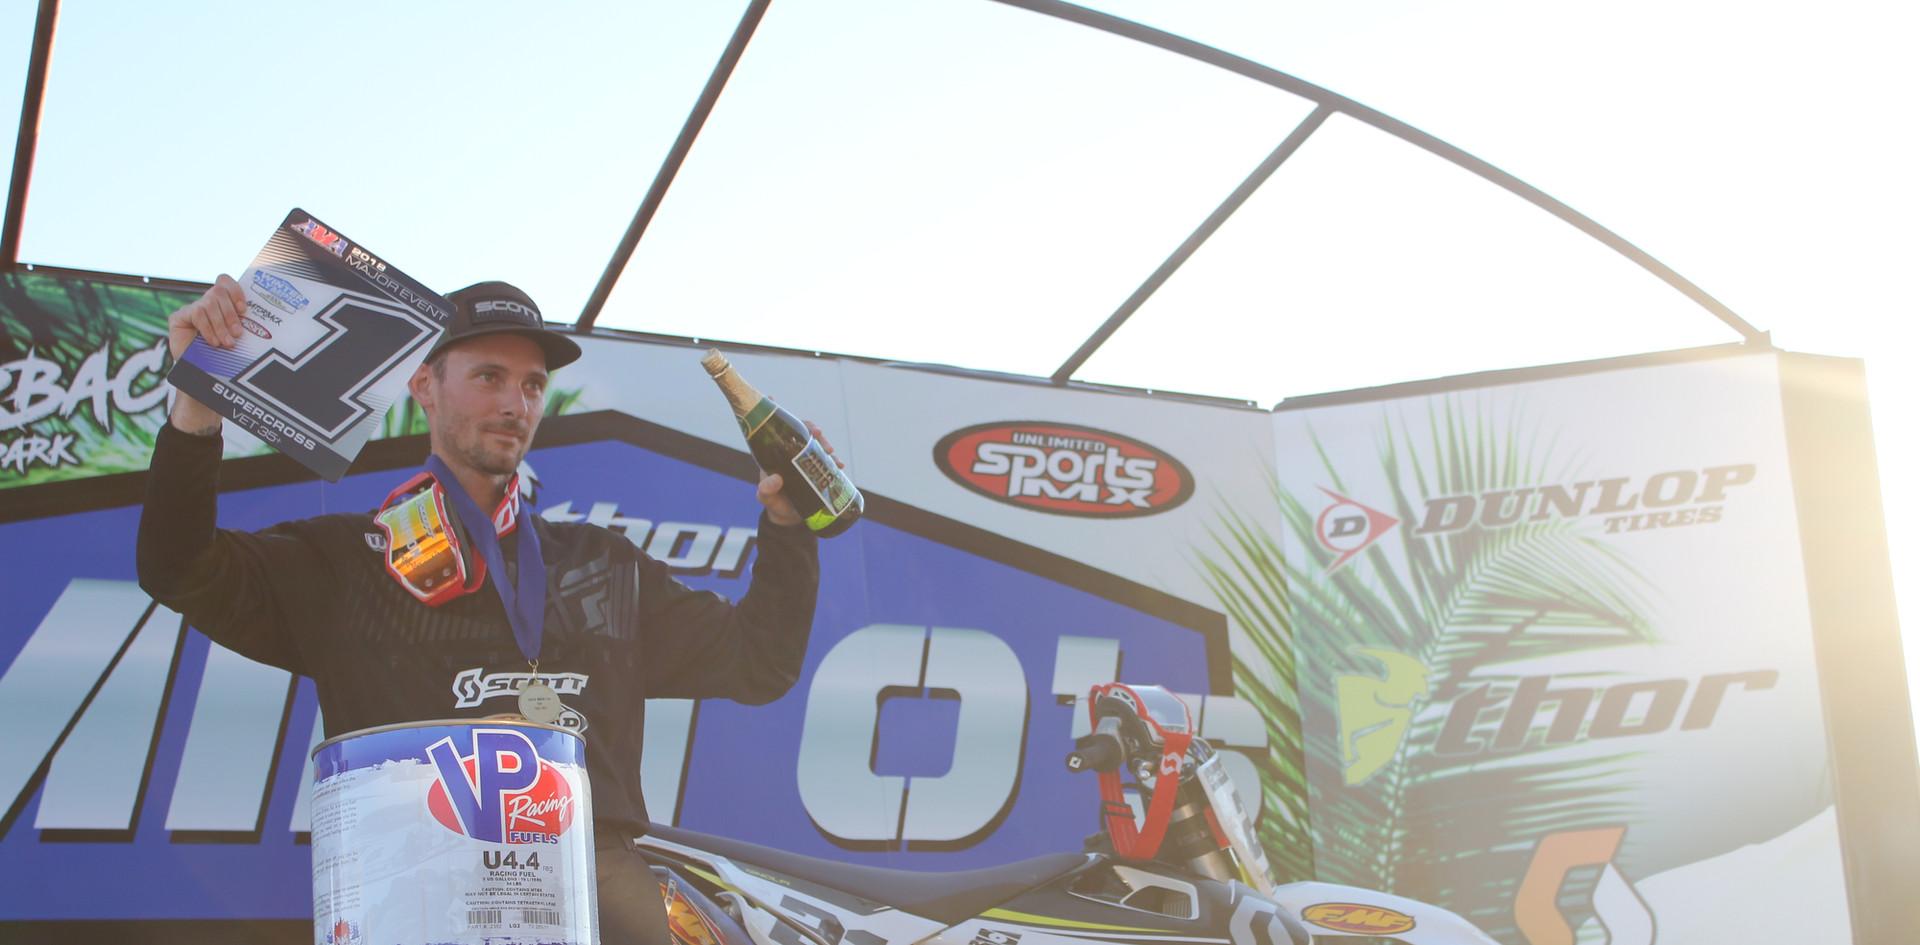 New champion on the podium